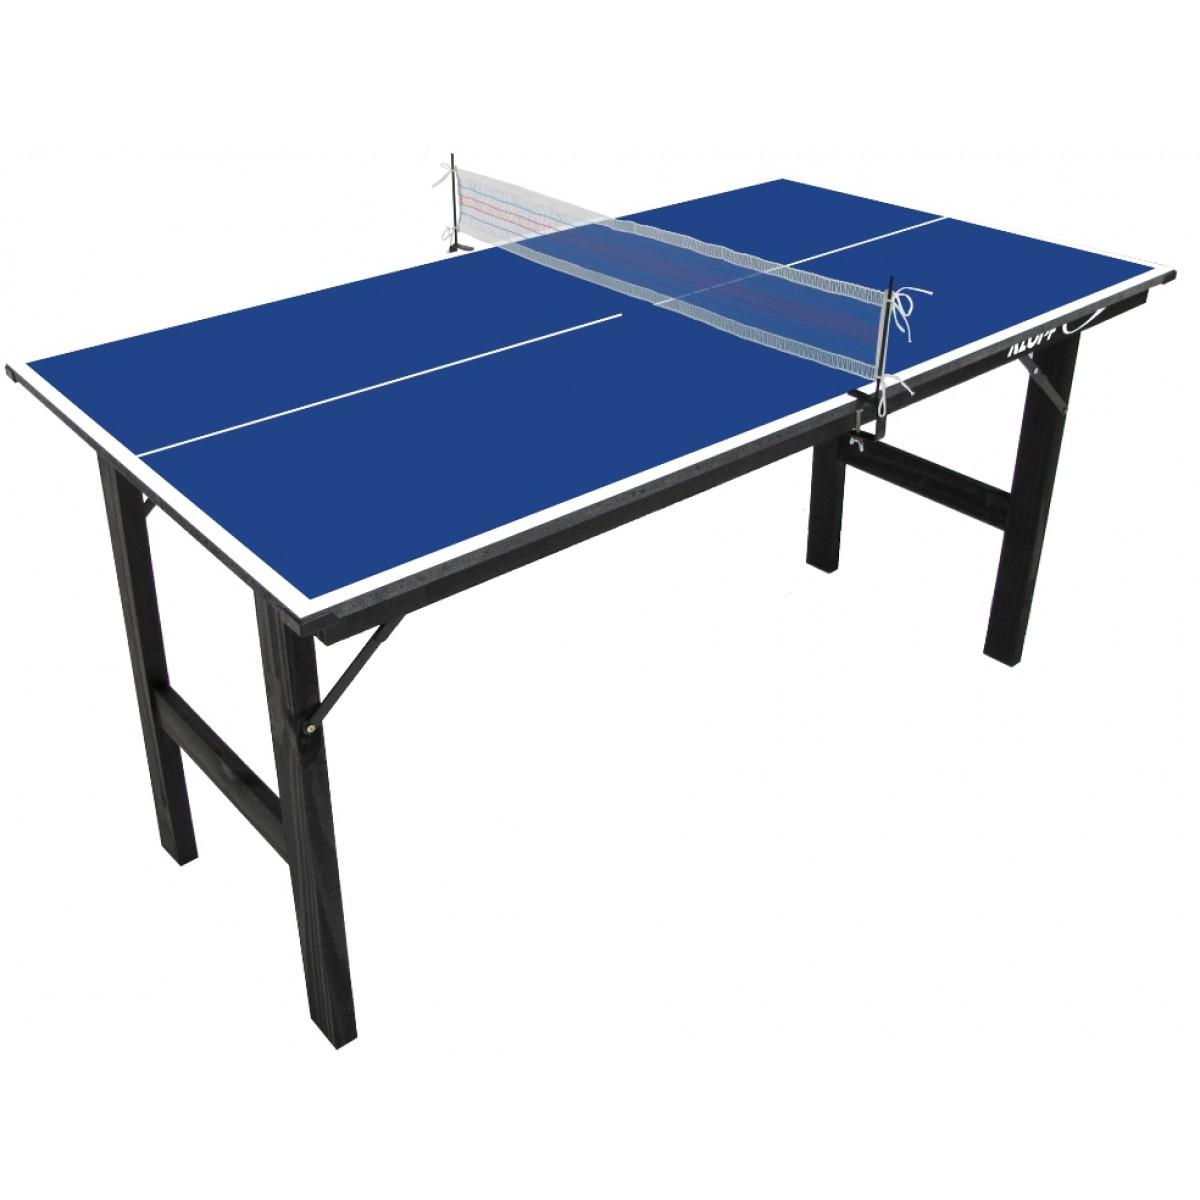 Mini mesa de ping pong klopf 12mm em mdp 1003 for Mesa ping pong carrefour